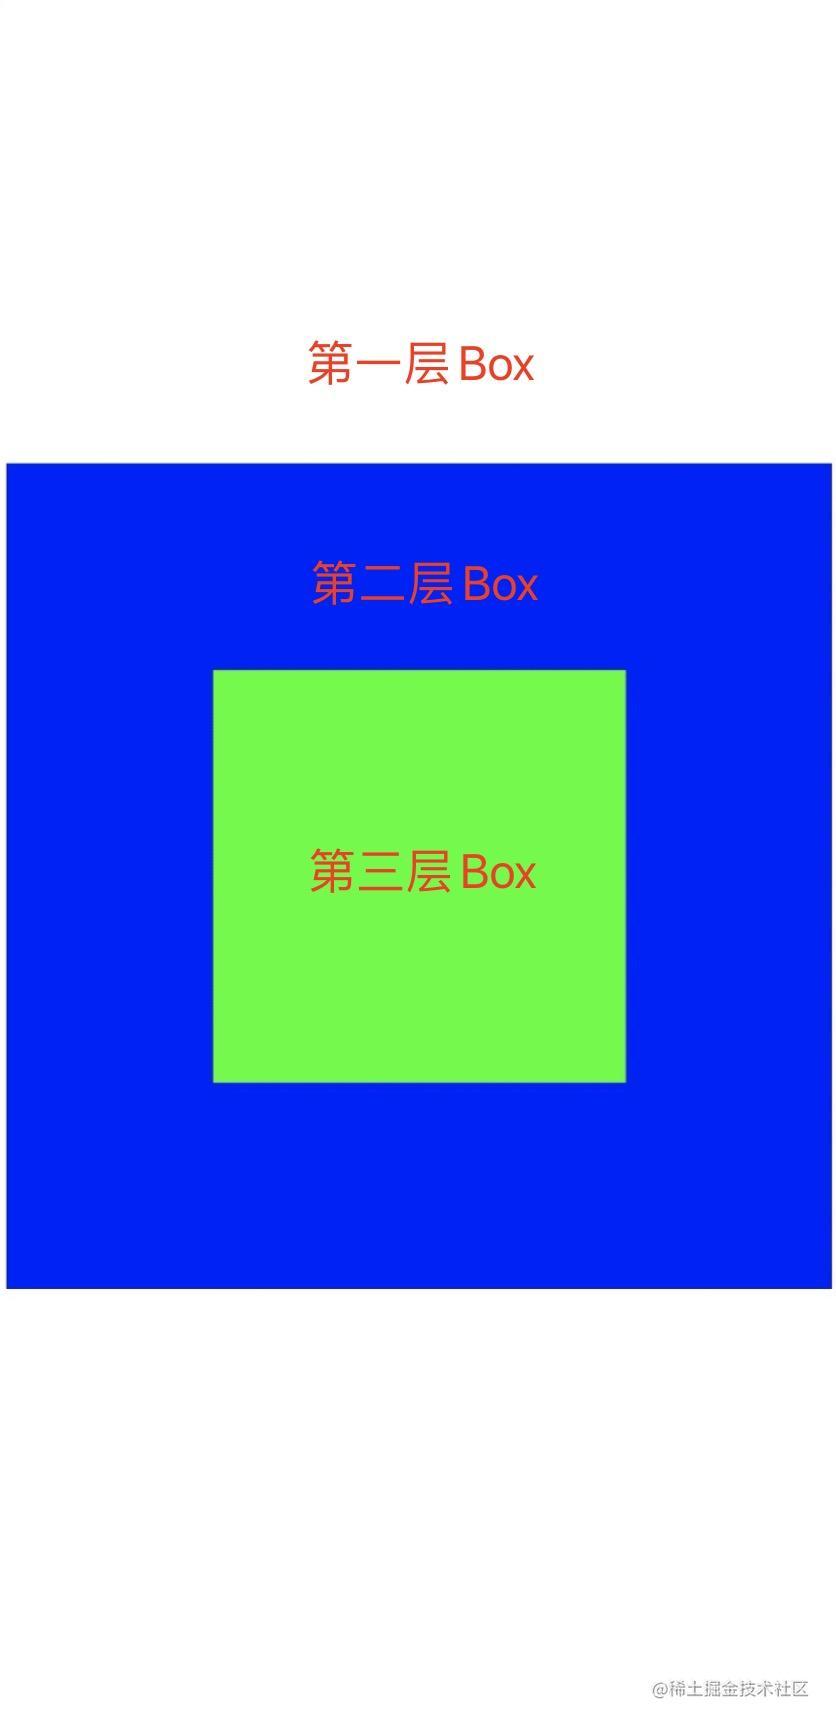 box_nest.jpg